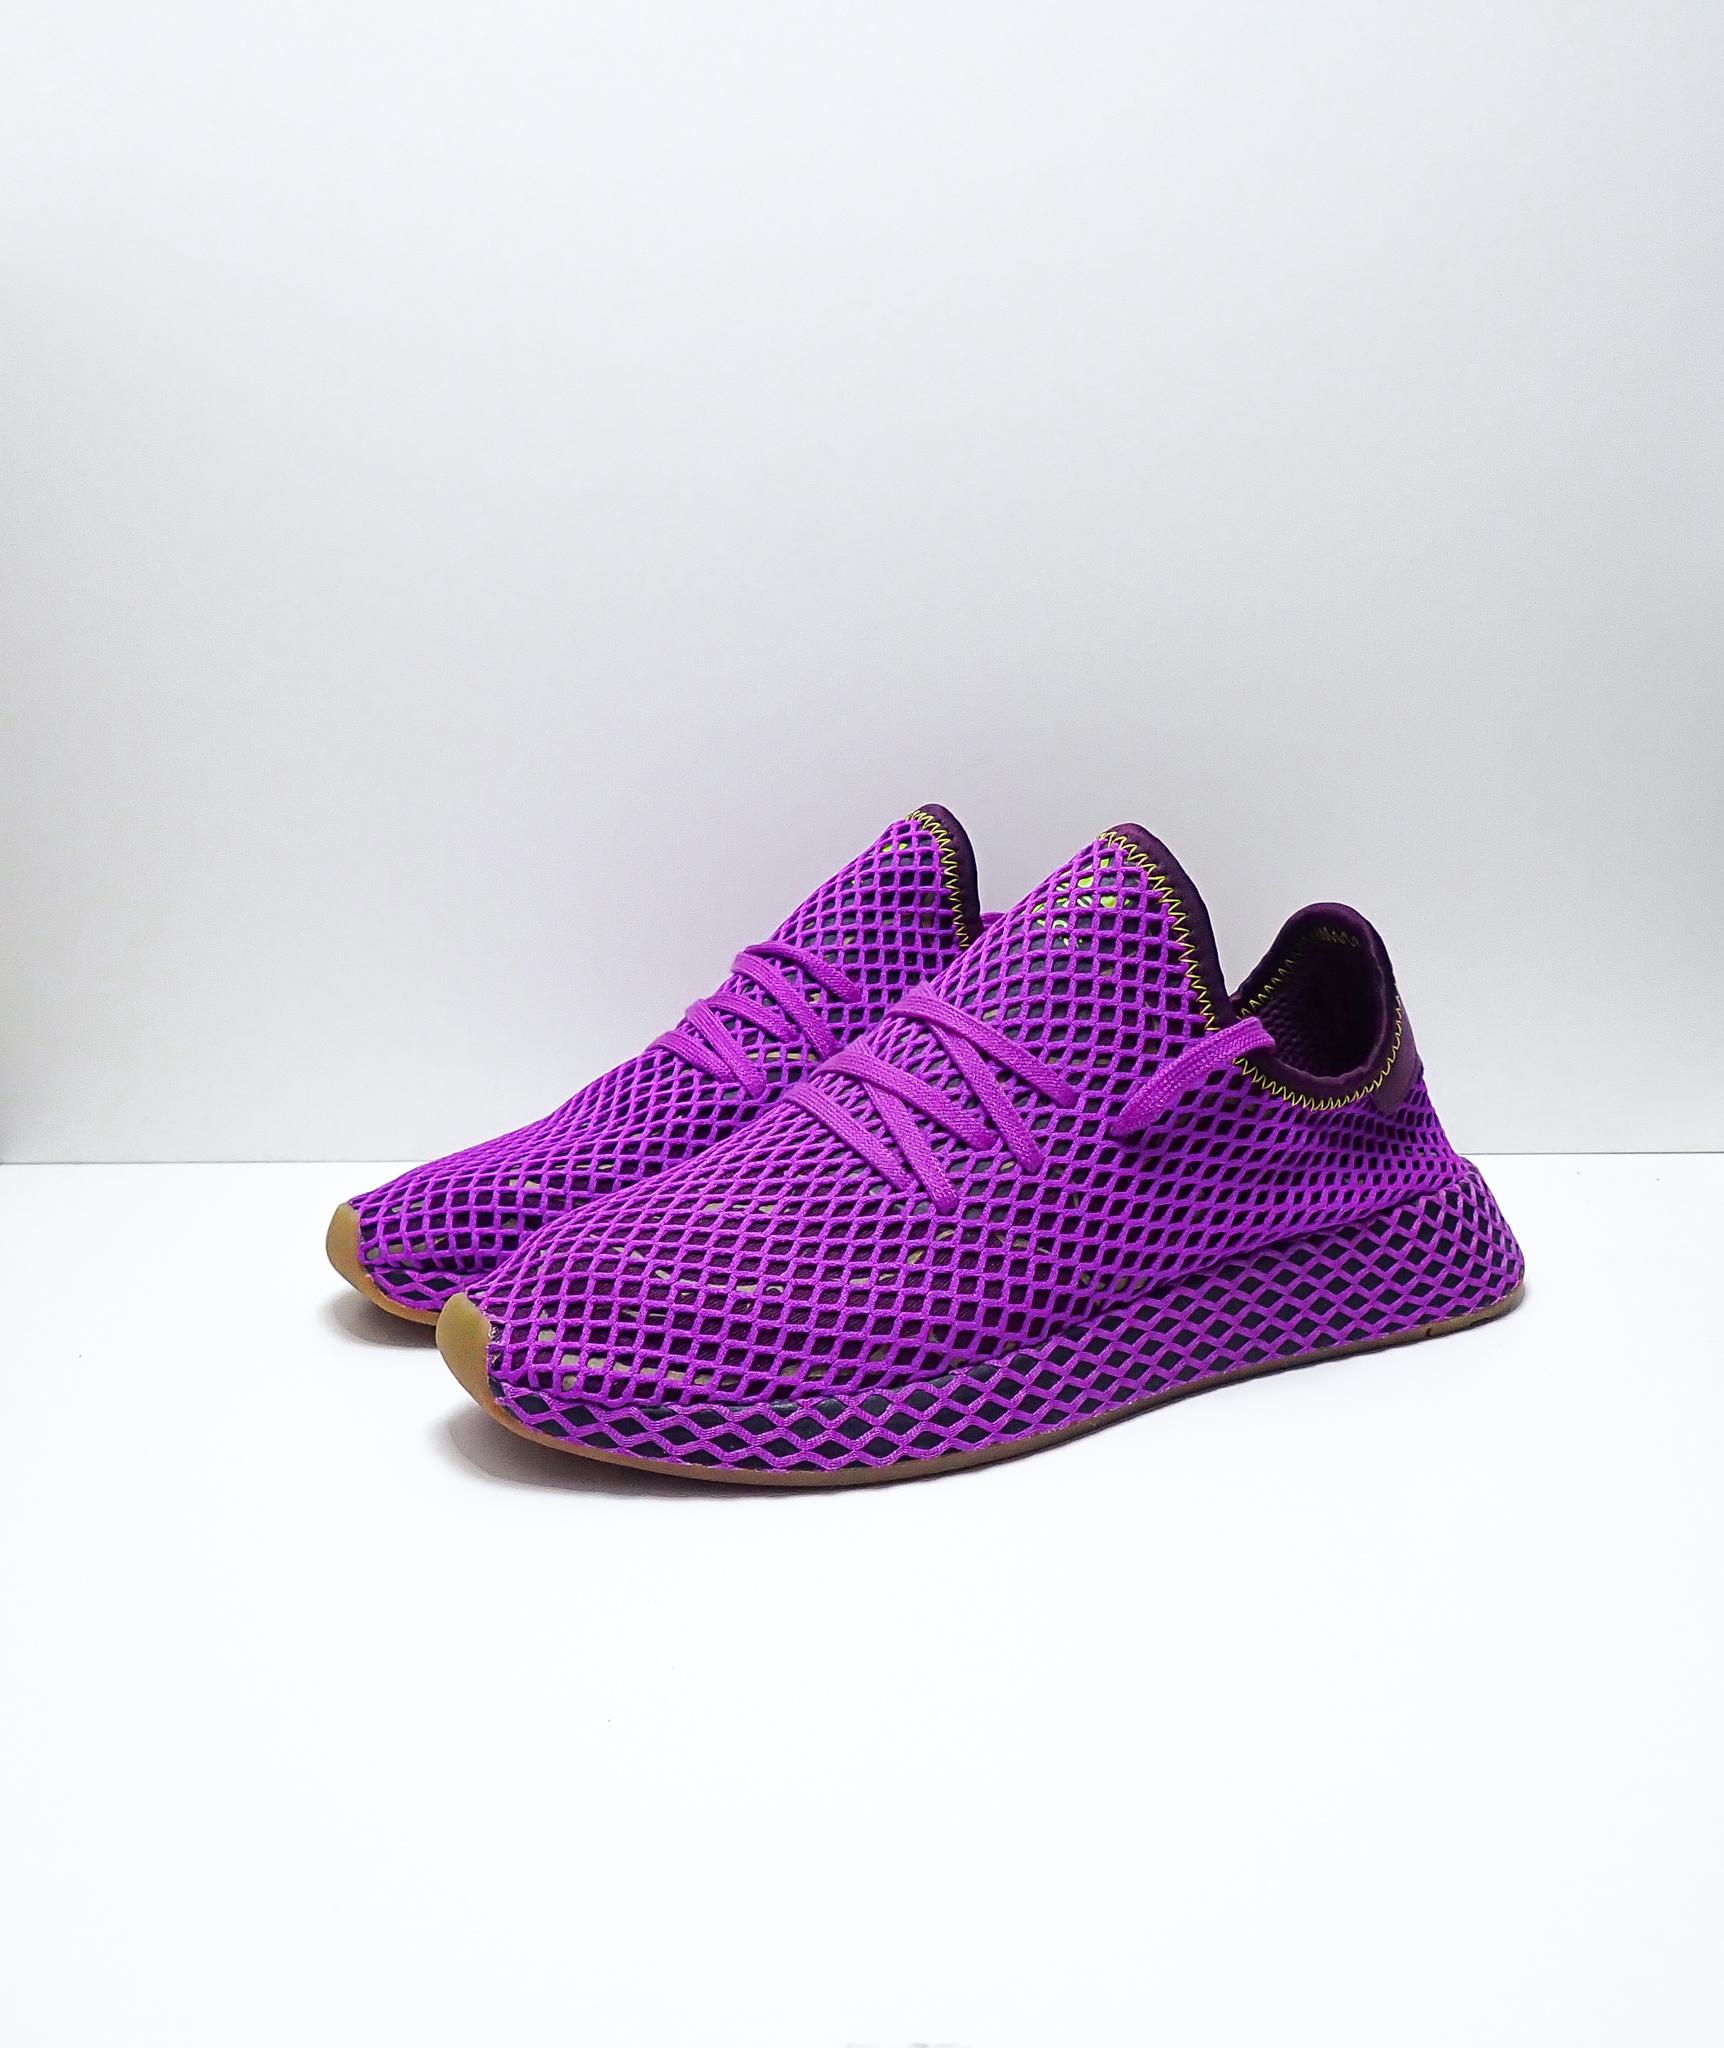 Adidas Deerupt Dragonball Z Son Gohan